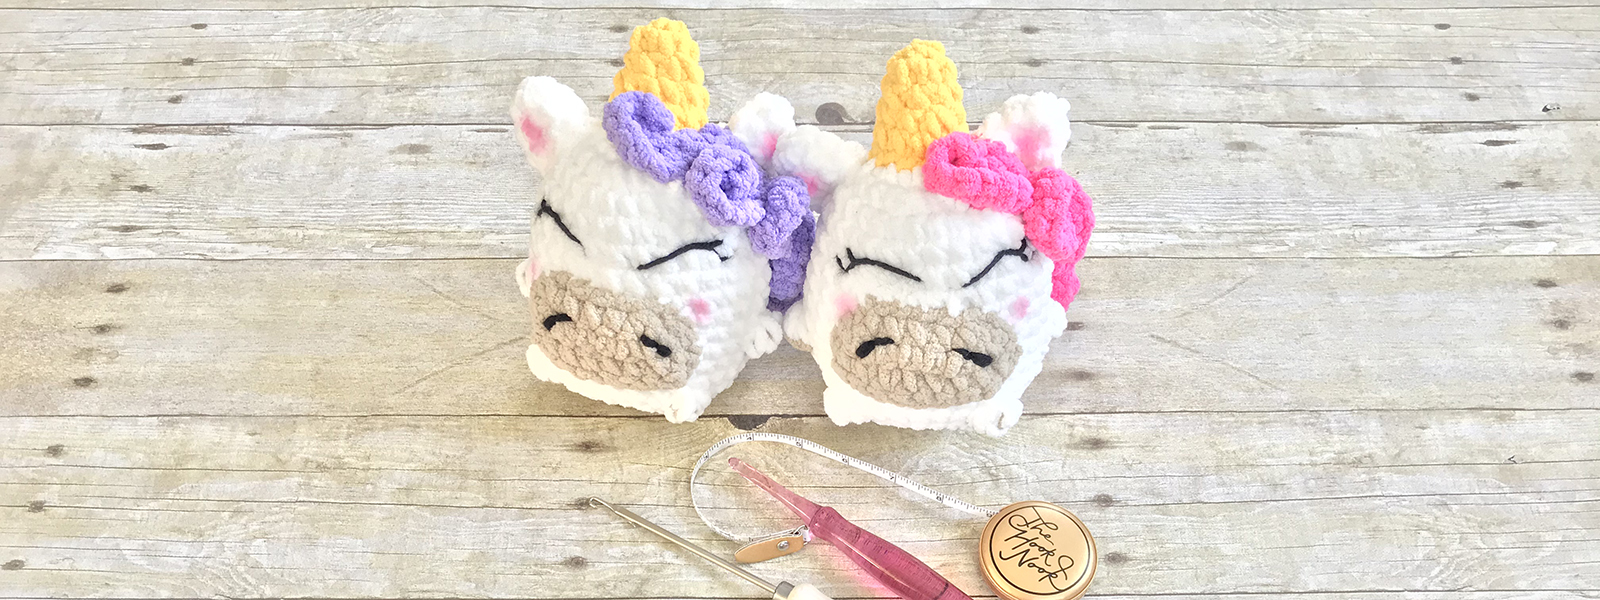 Crochet Despicable Me Unicorn — Lifted Geek | 600x1600